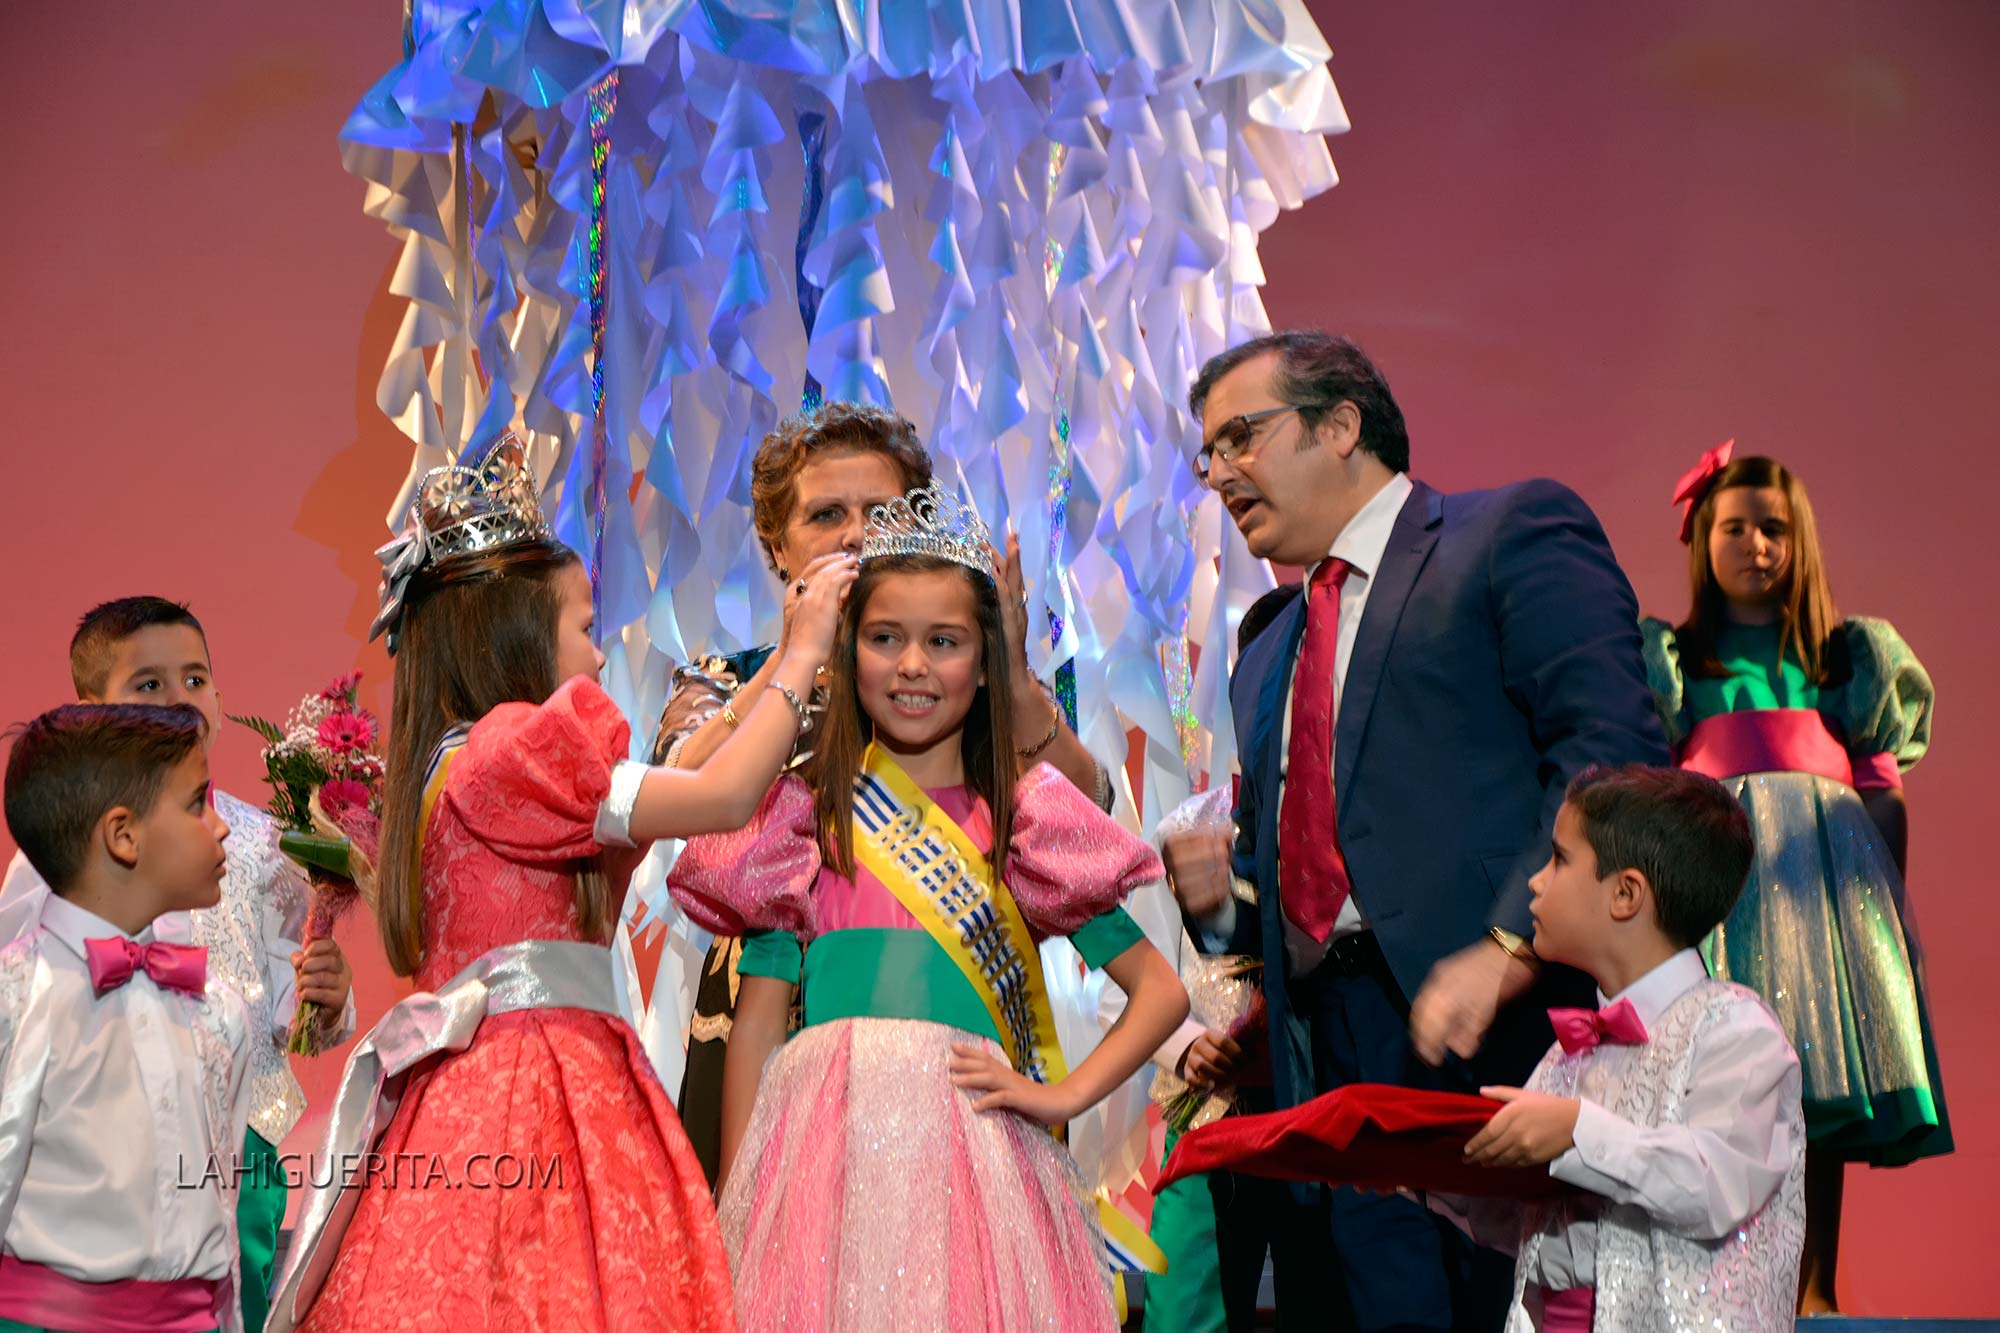 Coronacion infantil carnaval isla cristina 2016 _DSC2233